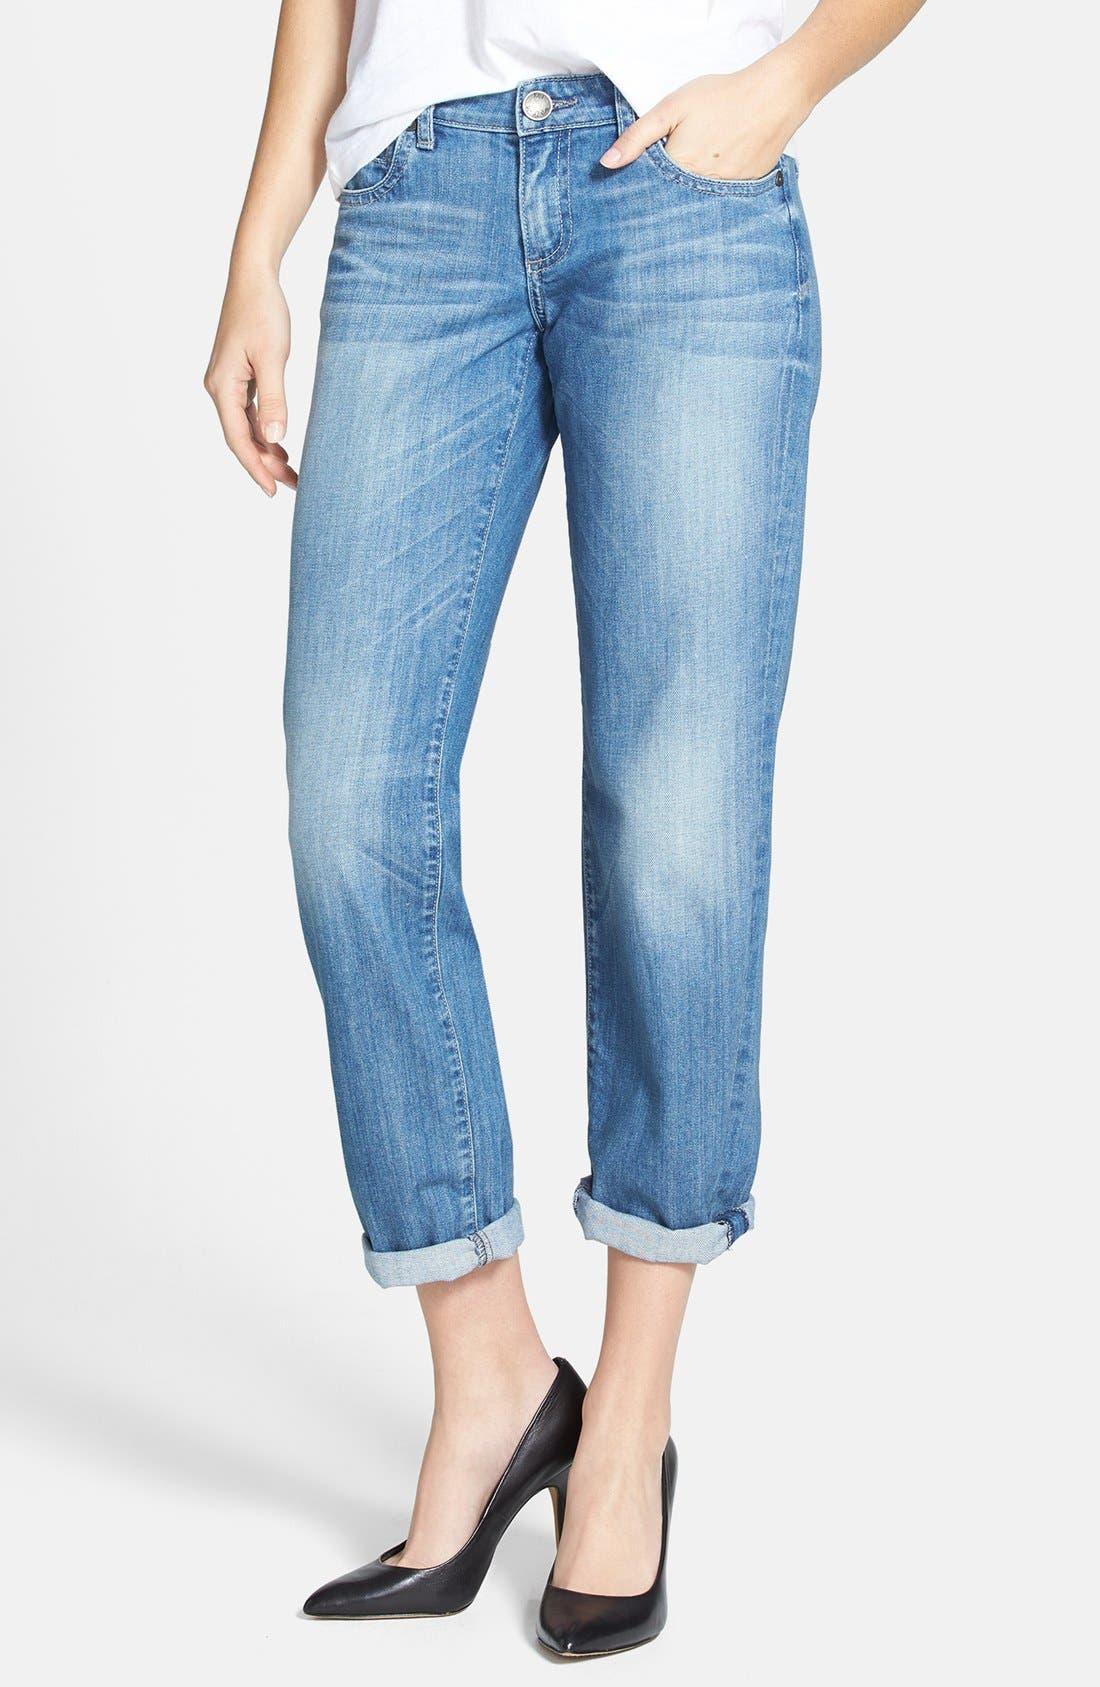 Main Image - KUT from the Kloth 'Catherine' Slim Boyfriend Jeans (Exceptional) (Regular & Petite)